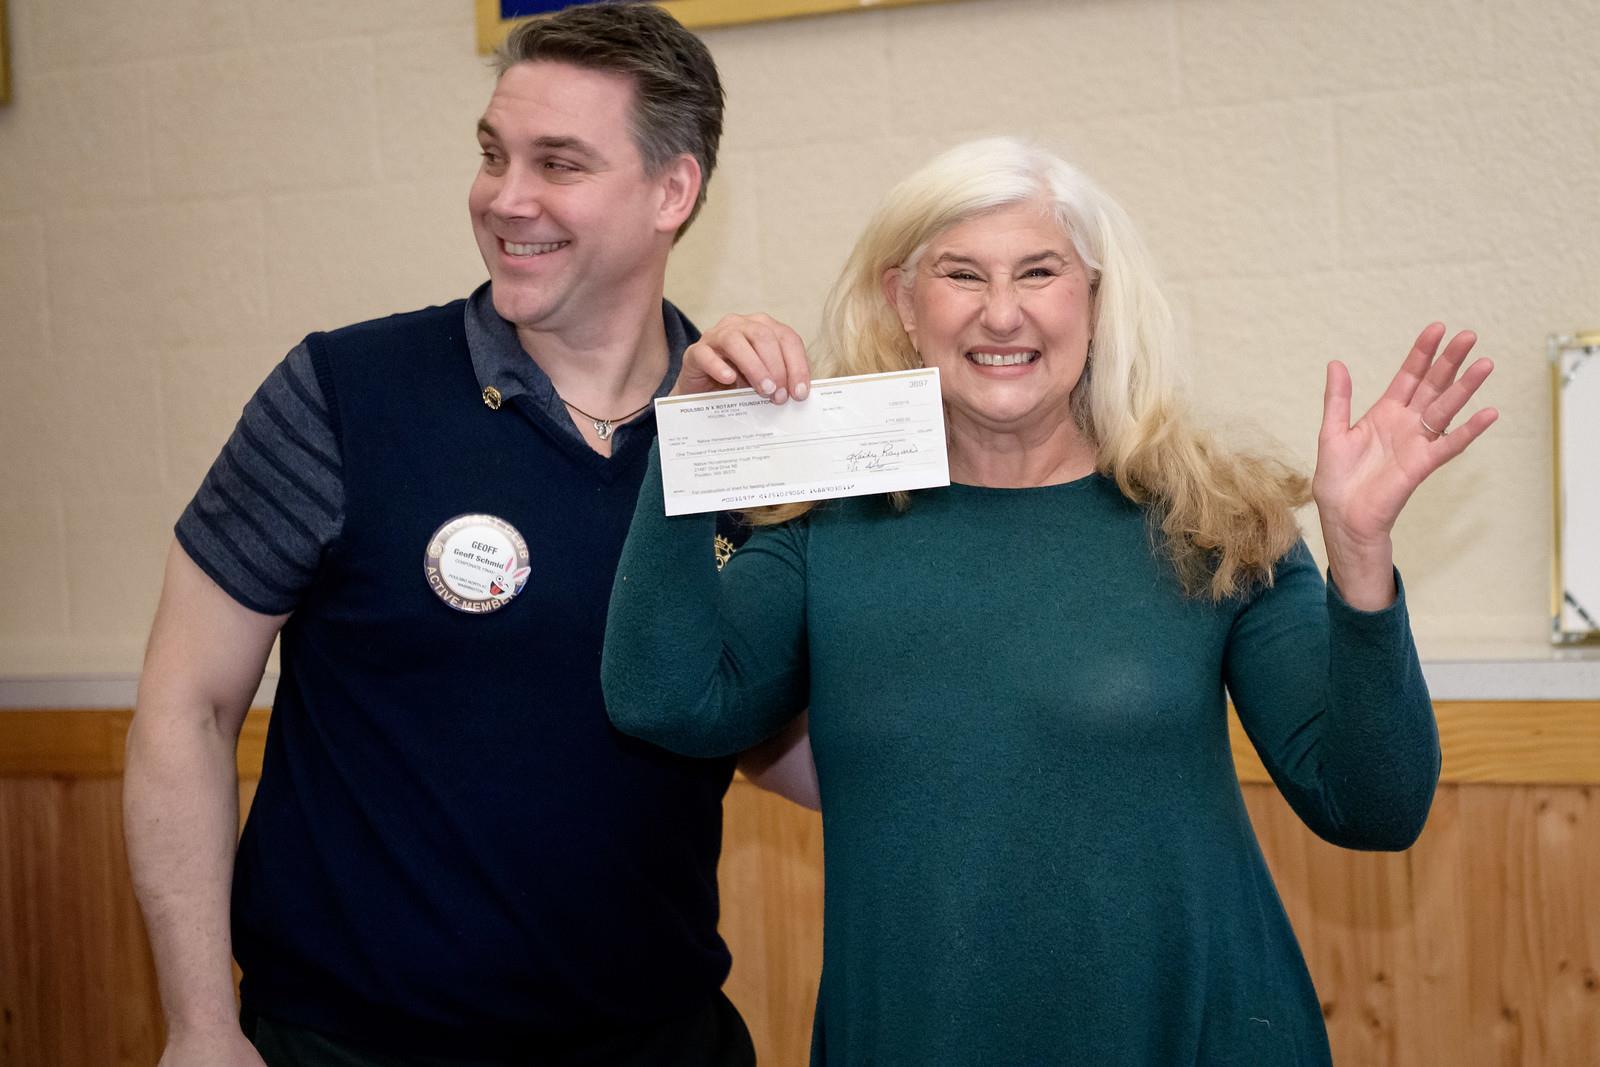 Geoff Schmidt presented a check to Lee Ferguson of the Native American  Horsemanship Youth program 57cbdc0bc87